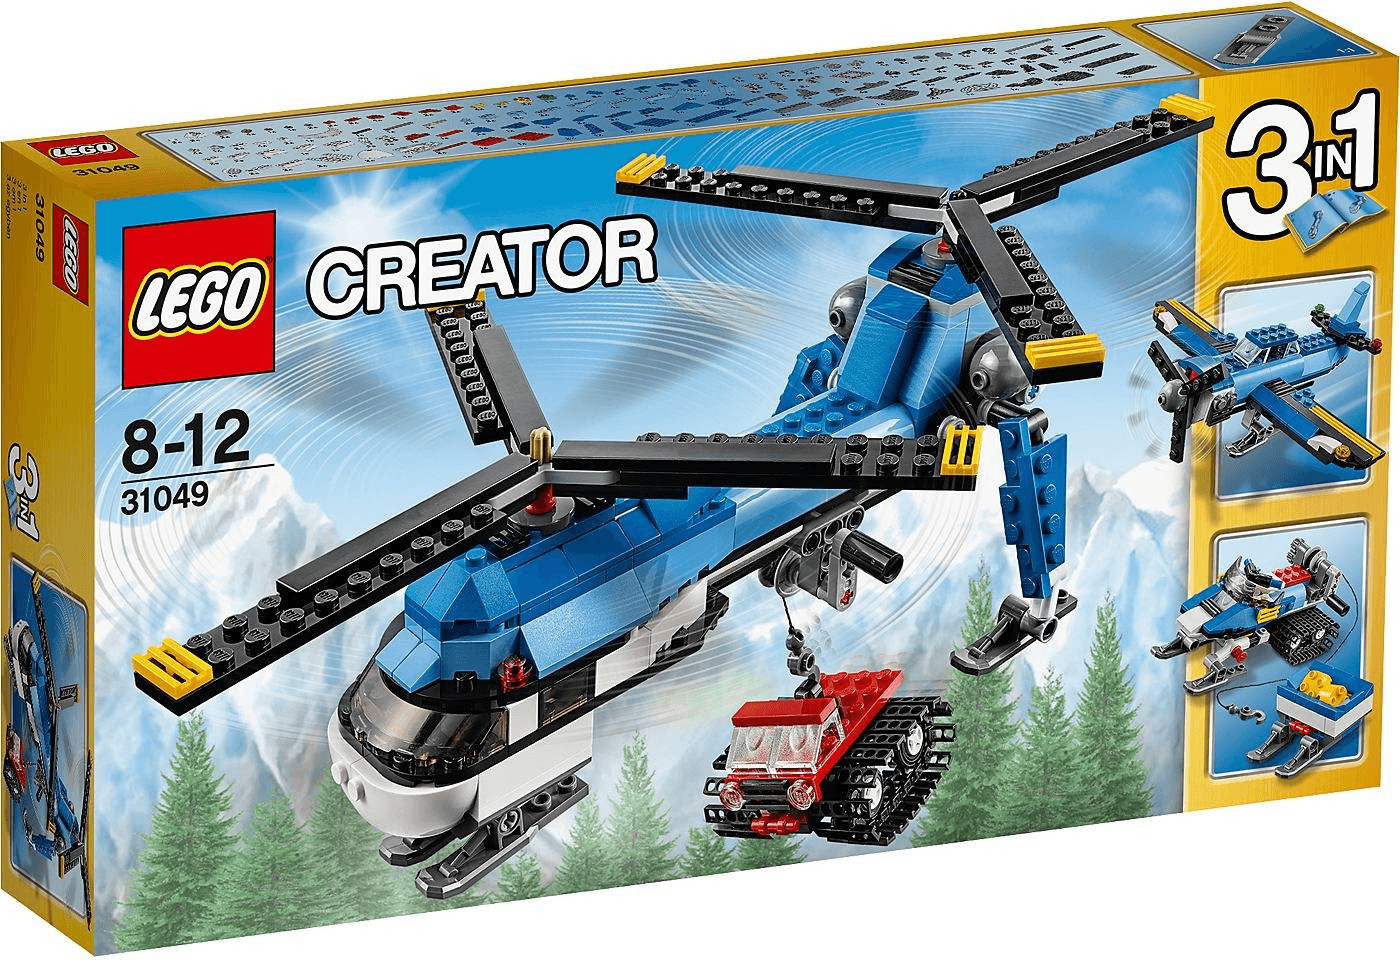 LEGO Creator - Doppelrotor-Hubschrauber (31049)